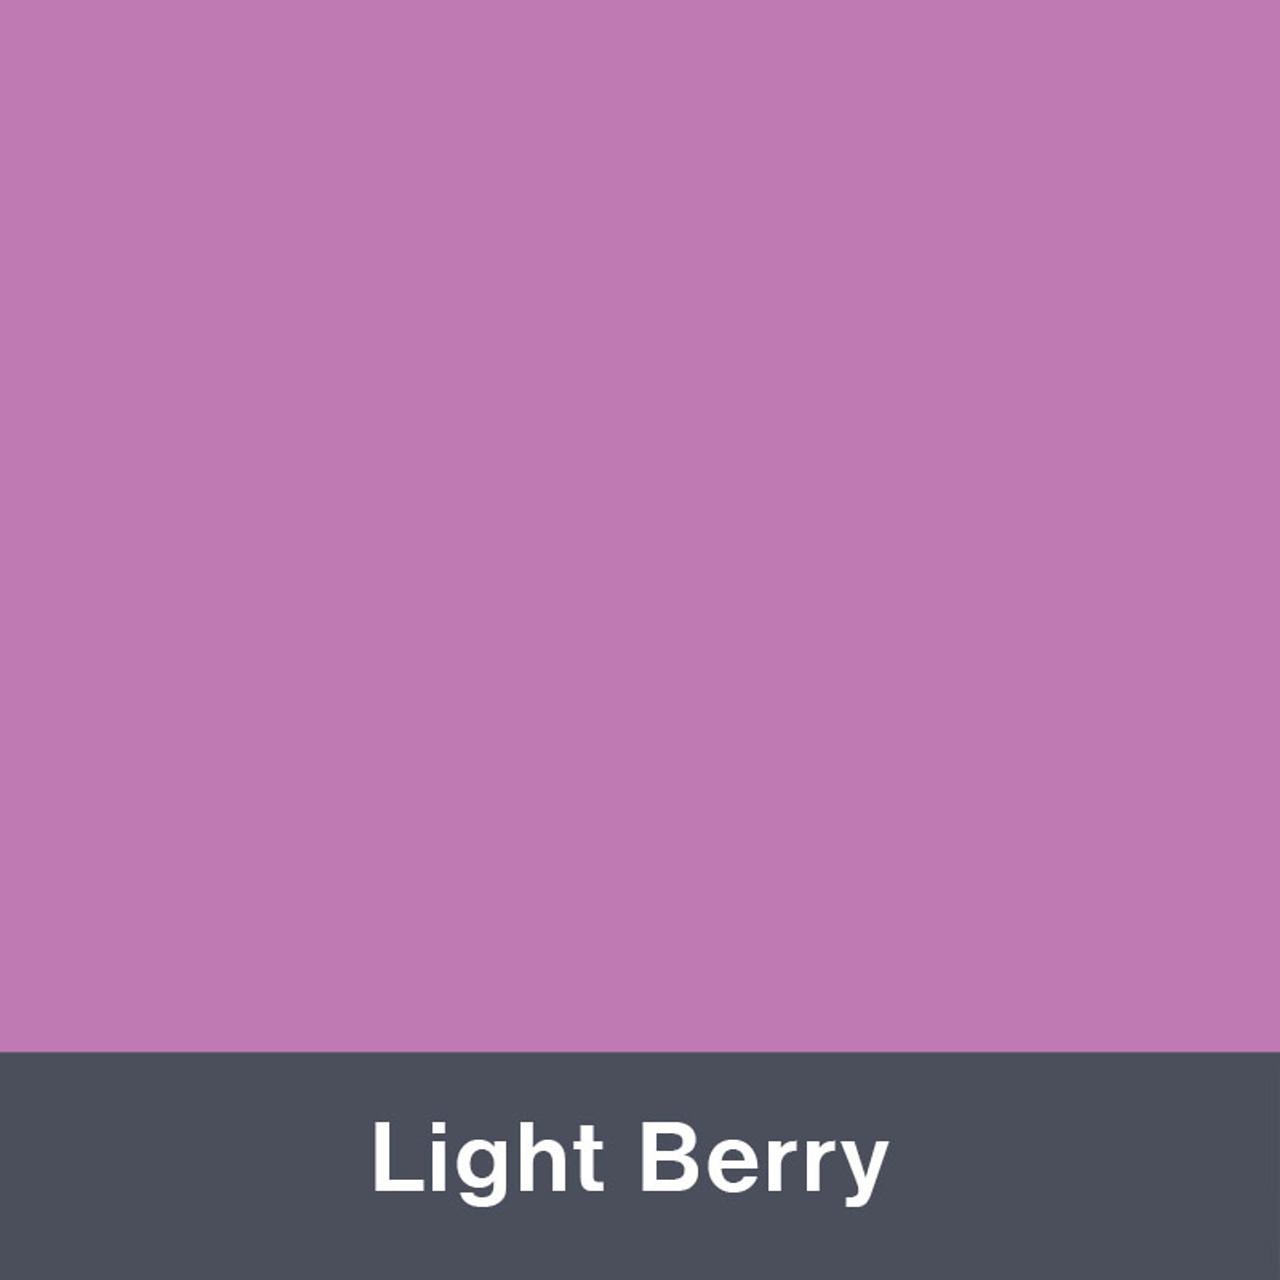 Iron-on Light Berry Turbo 4953